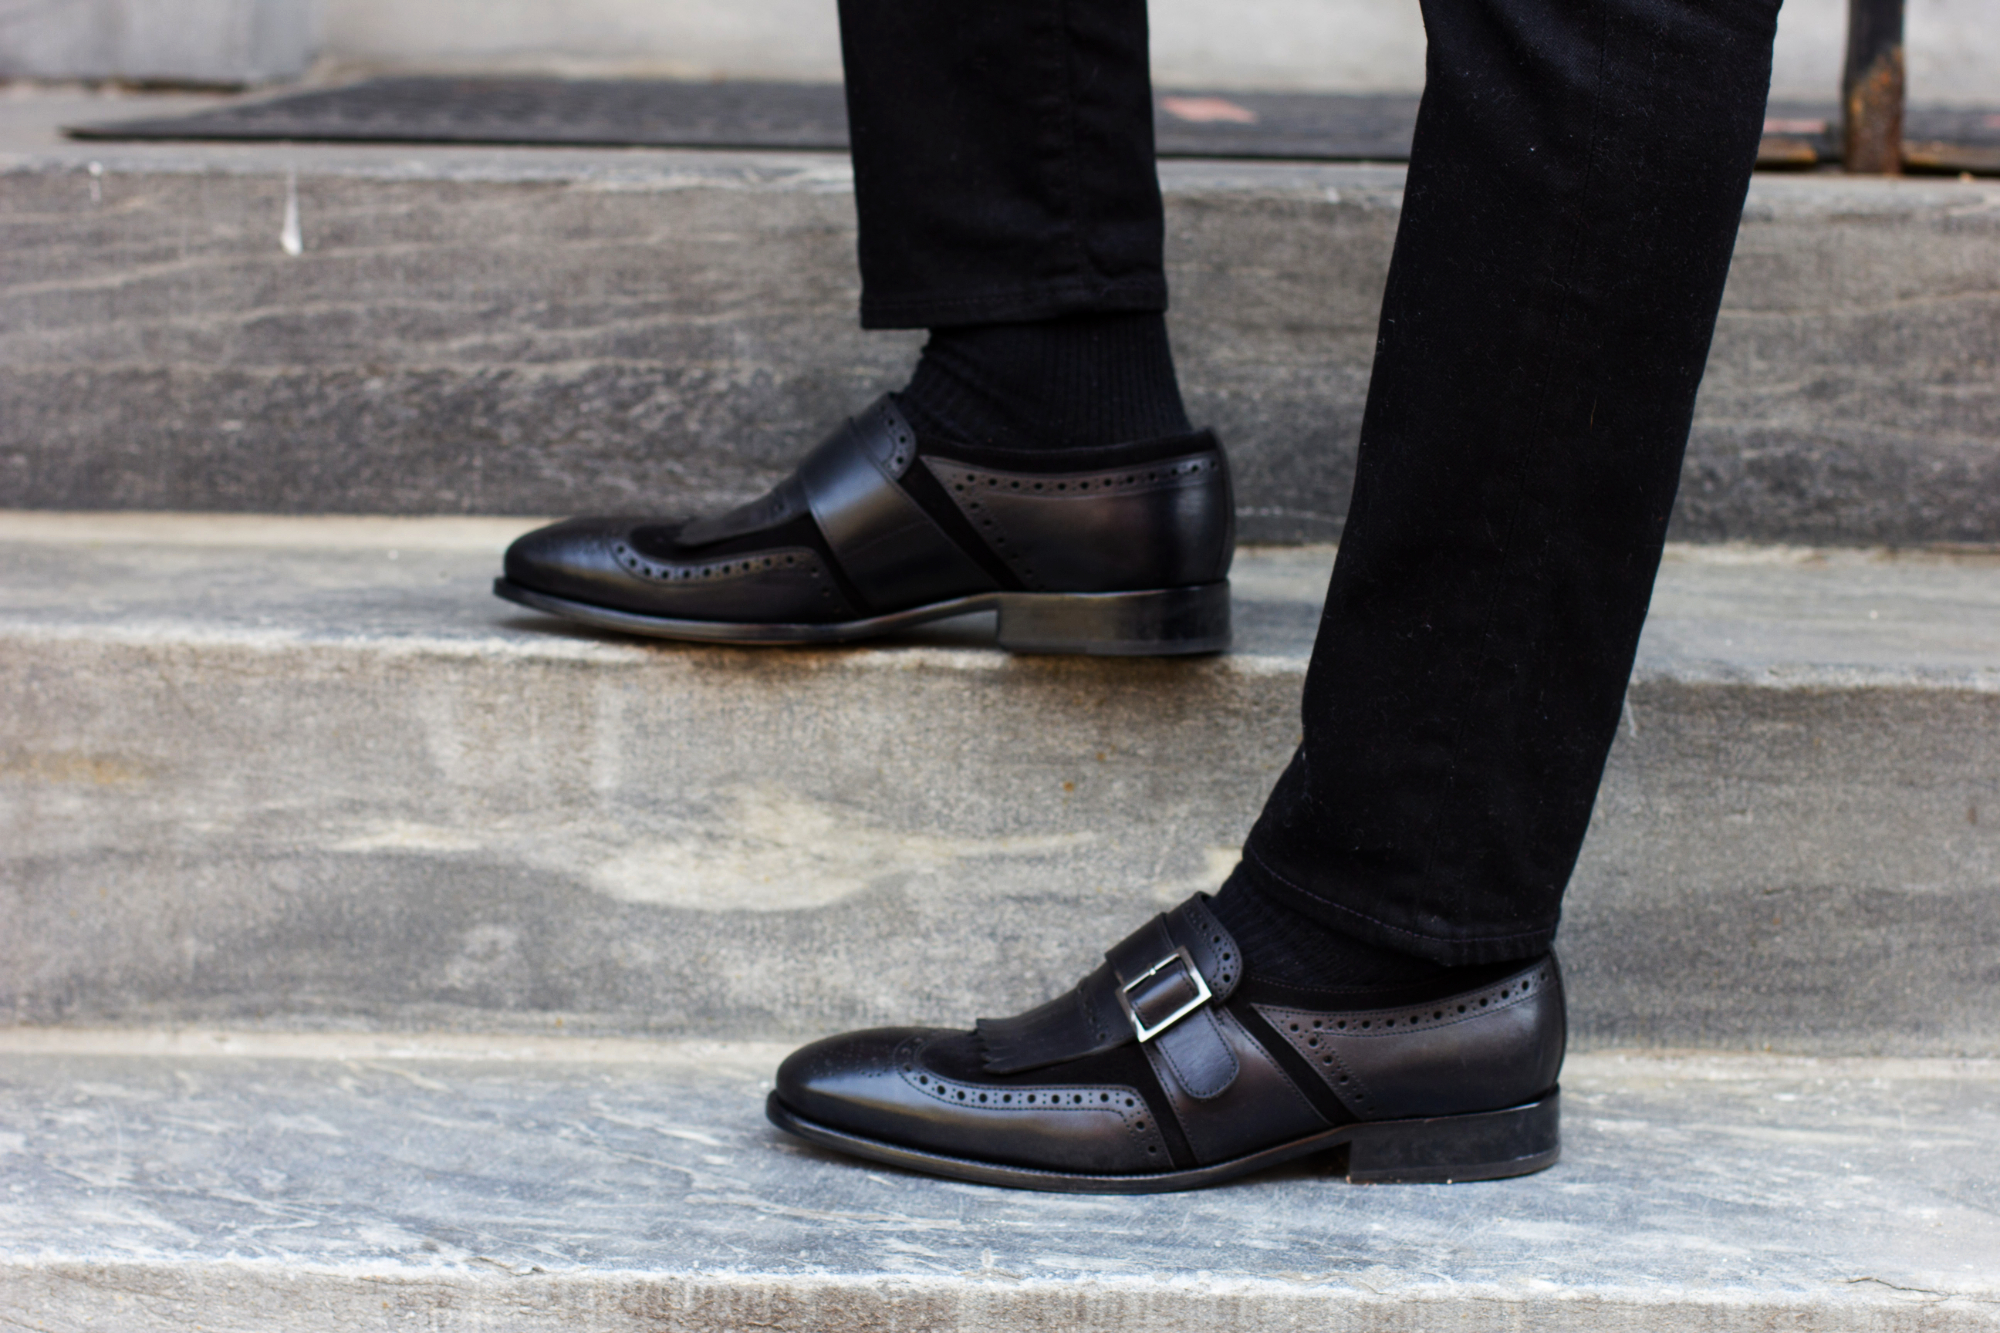 Kiltie Loafer by Cobble & Hyde on Men's Style Pro